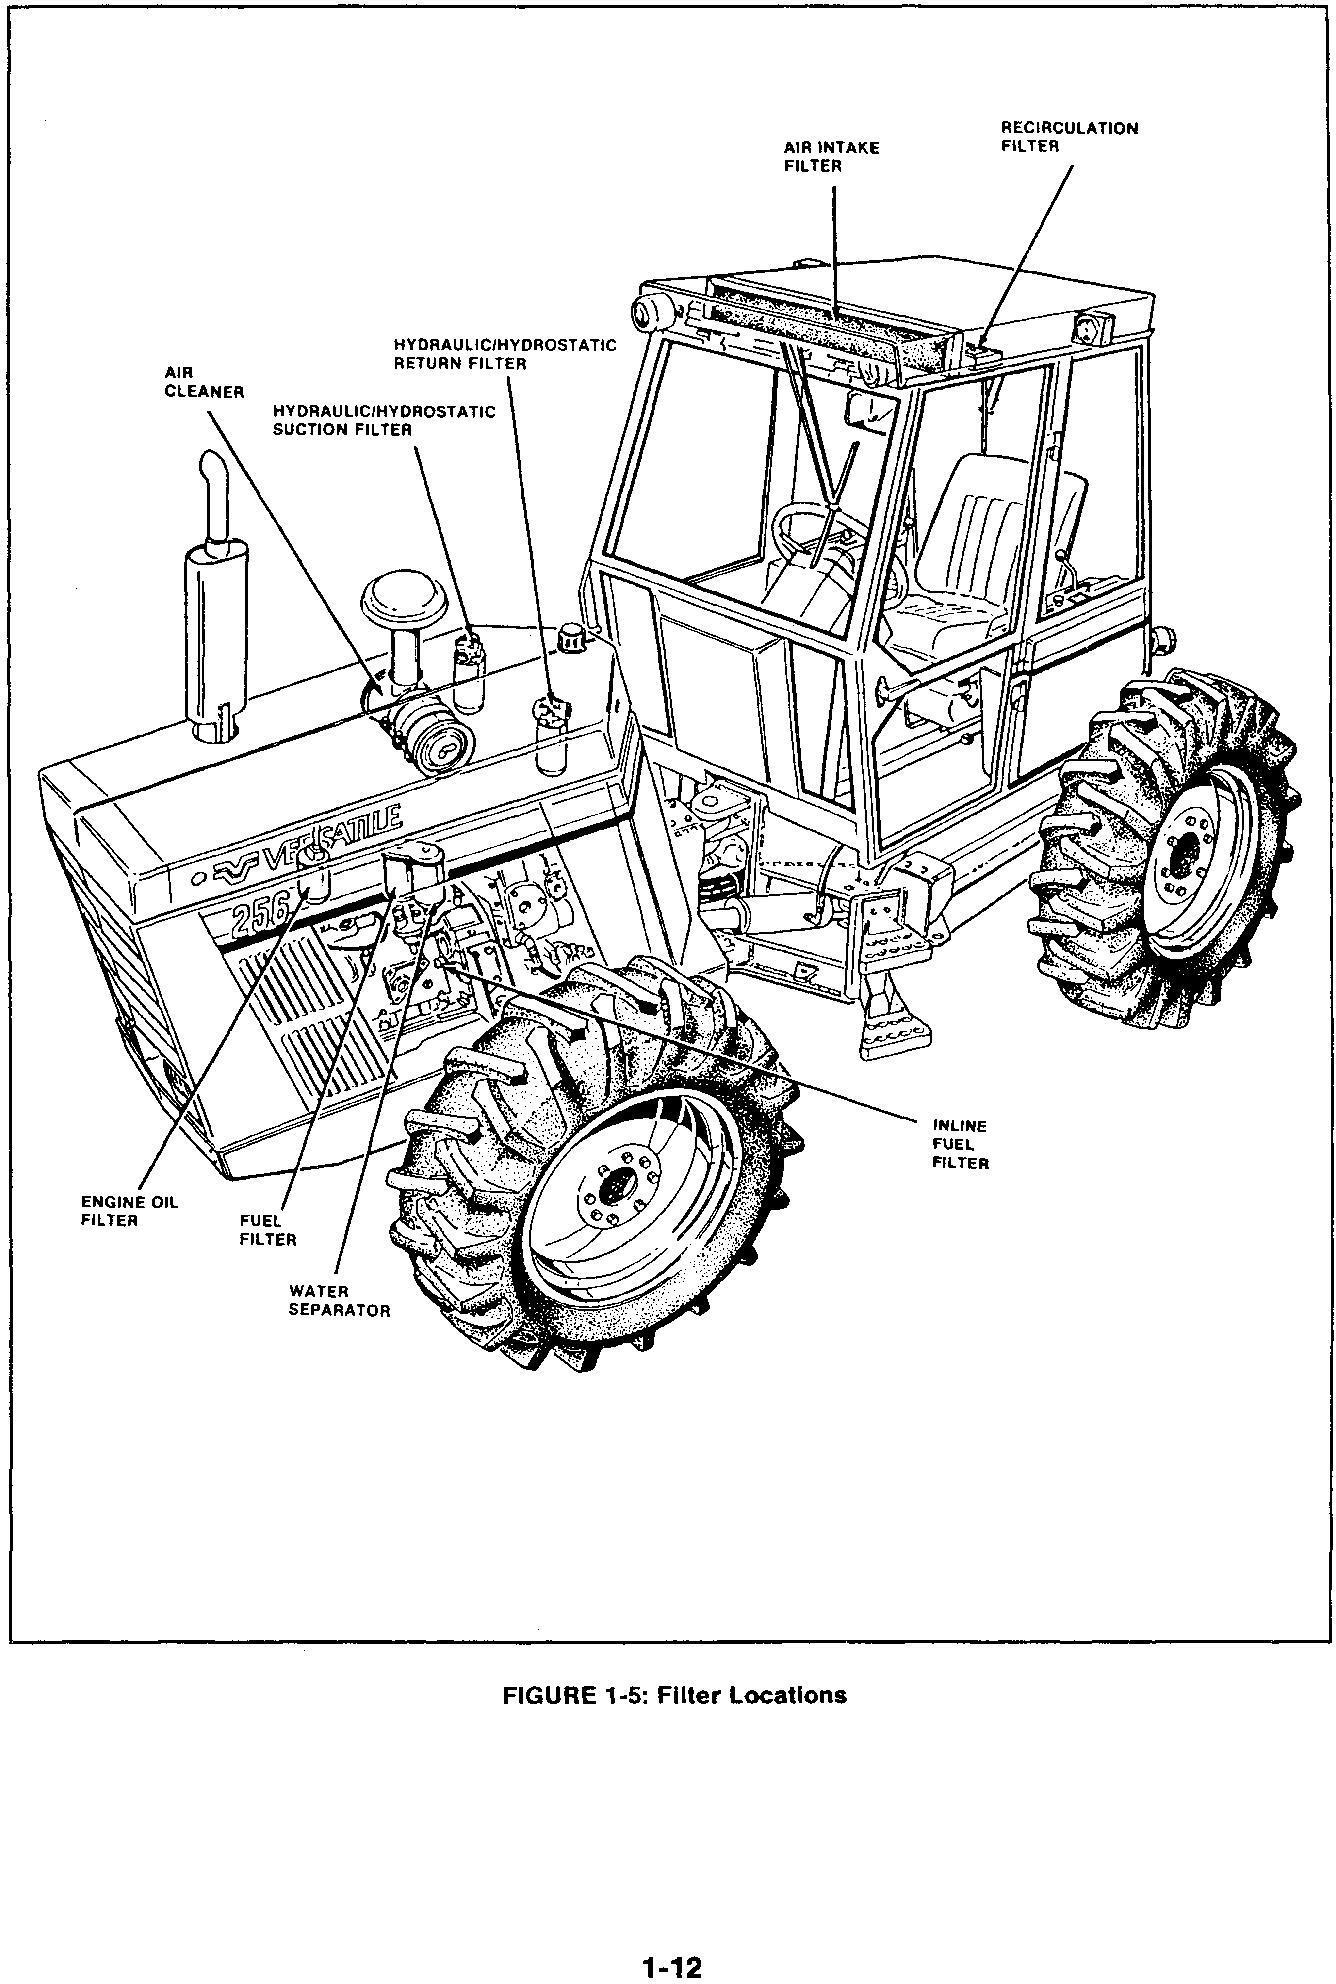 Ford 256, 276, 276 II Bi-directional Versatile Tractor Service Manual - 1